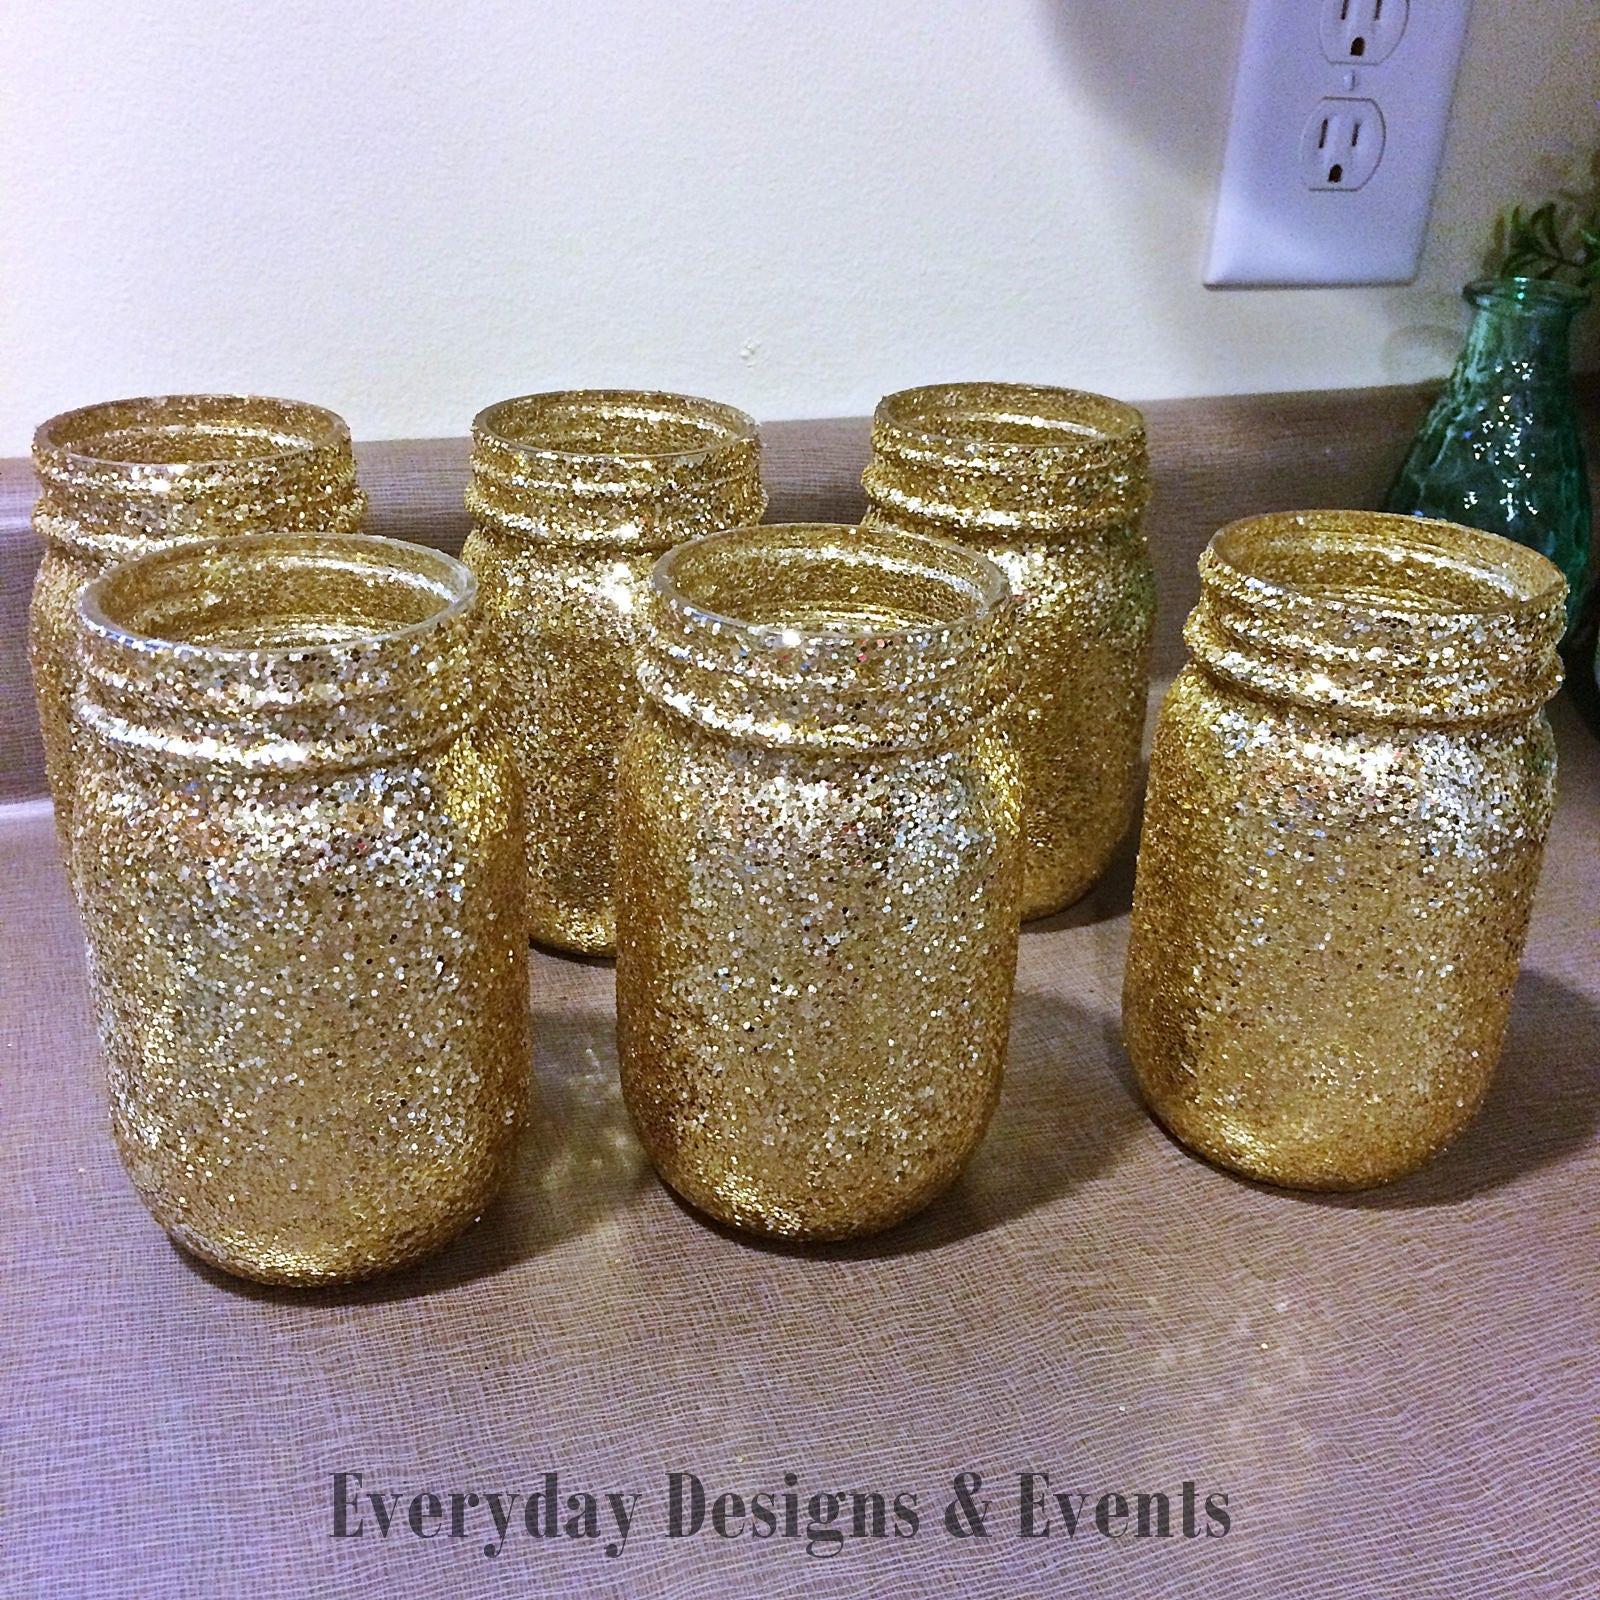 6 Mason Jar Centerpieces, Baby Shower Ideas, Baby Shower Decorations,  Wedding, Wedding Decorations, Wedding Centerpieces, Party Supplies